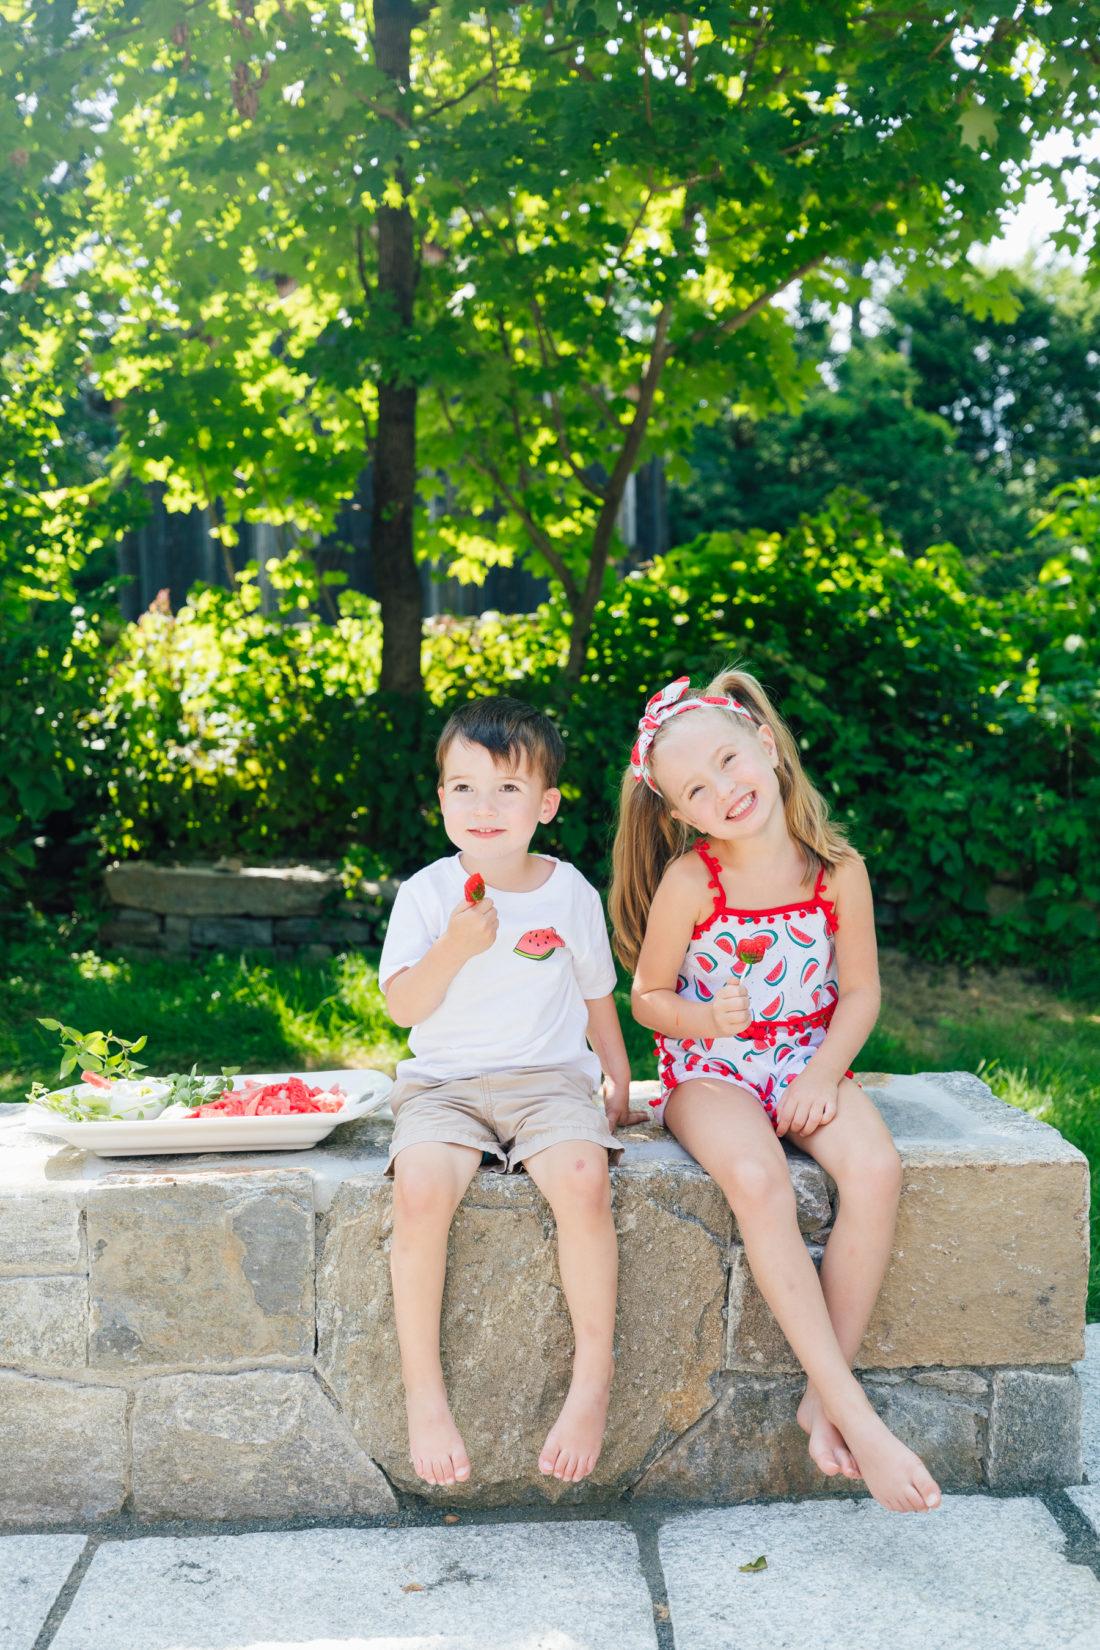 Eva Amurri Martino's daughter Marlowe and Major chow down on watermelon fries